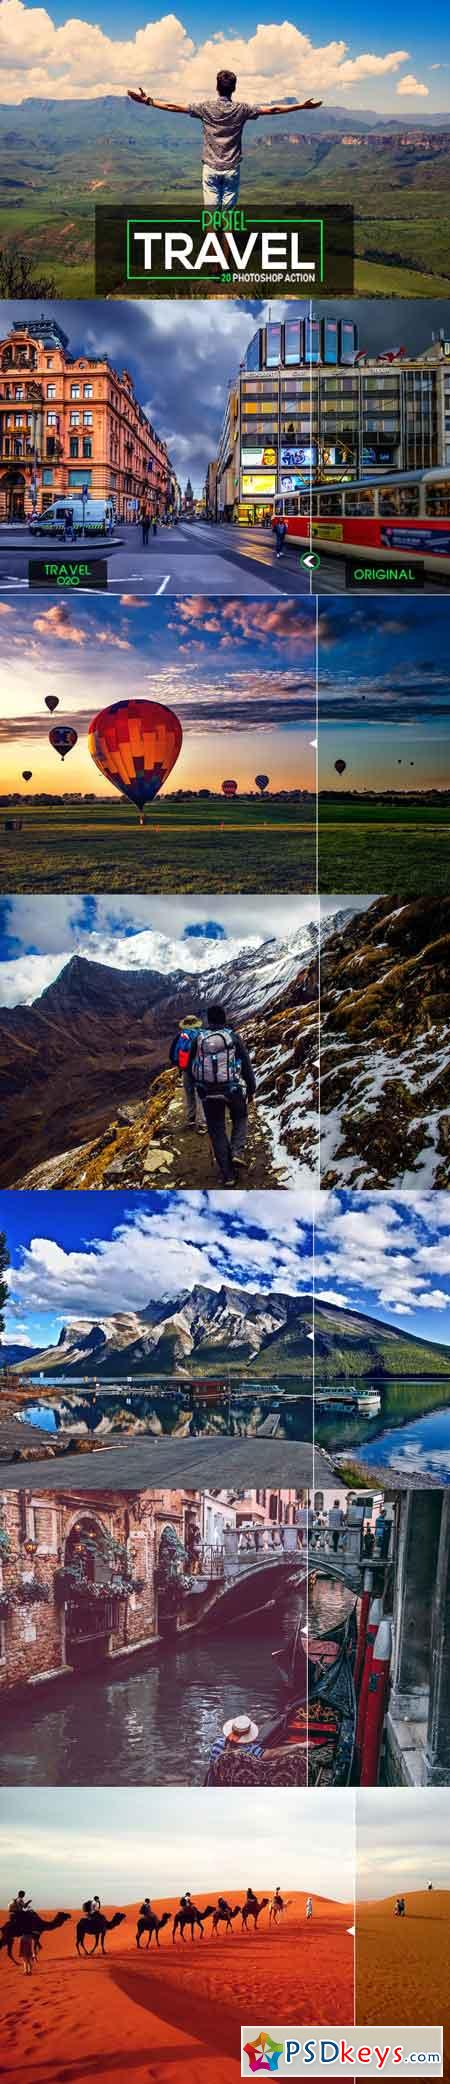 20 Pastel Travel Photoshop Action 3517449